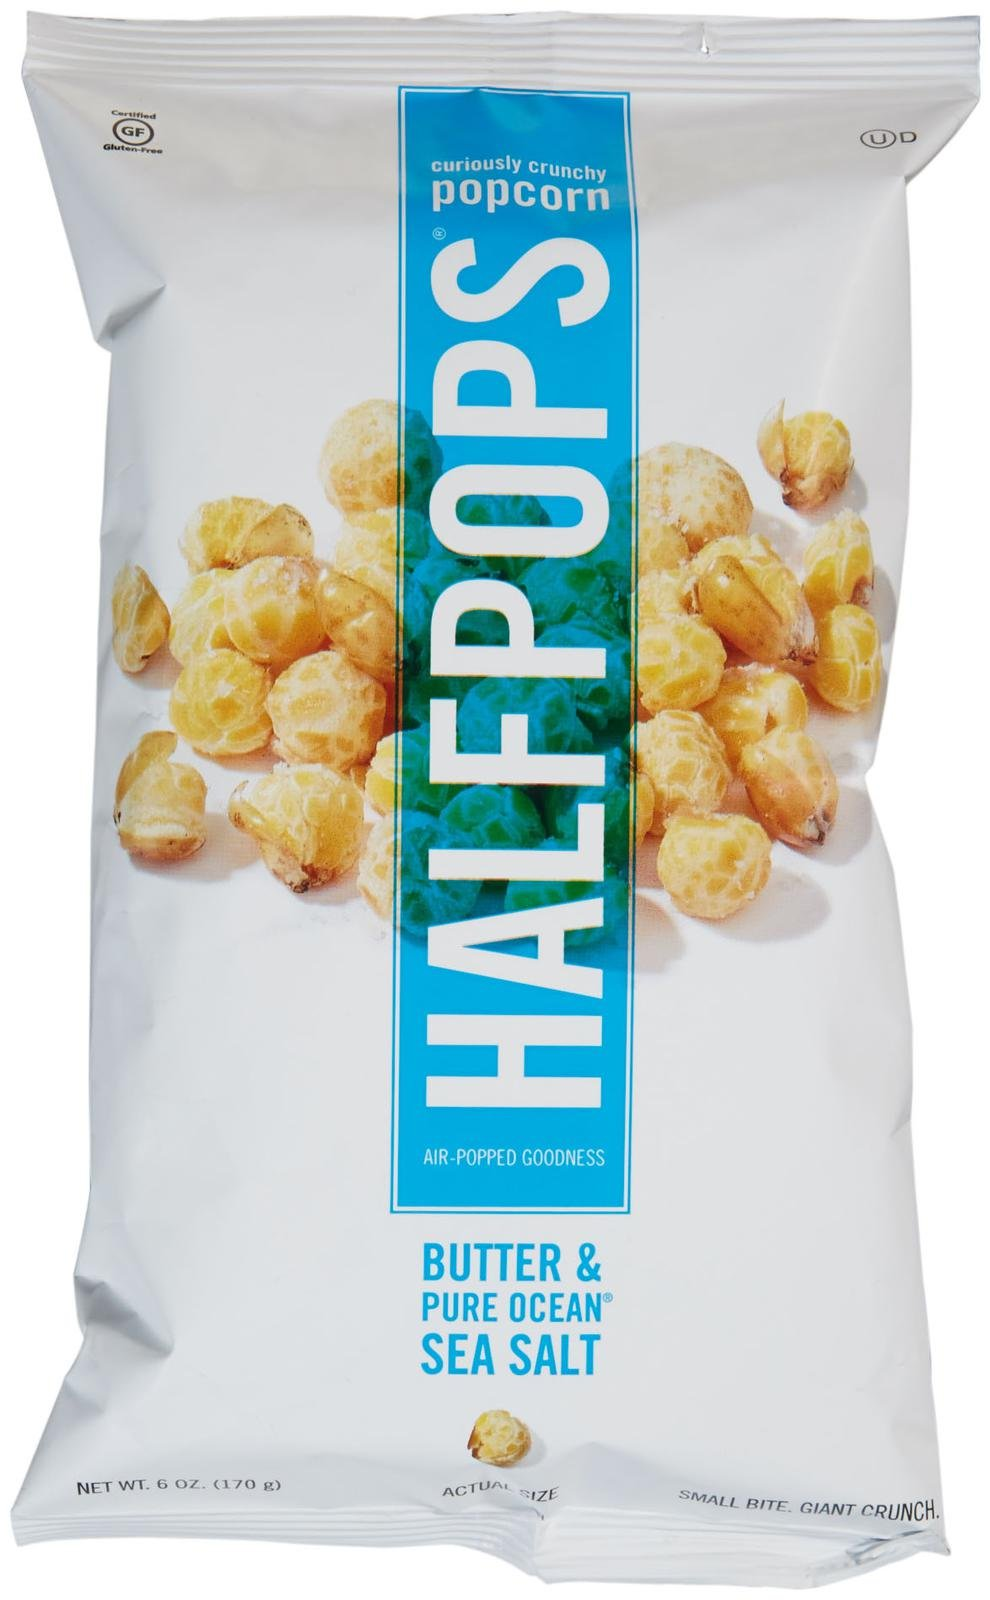 Halfpops Popcorn Butter & Pure Ocean Sea Salt 6 oz